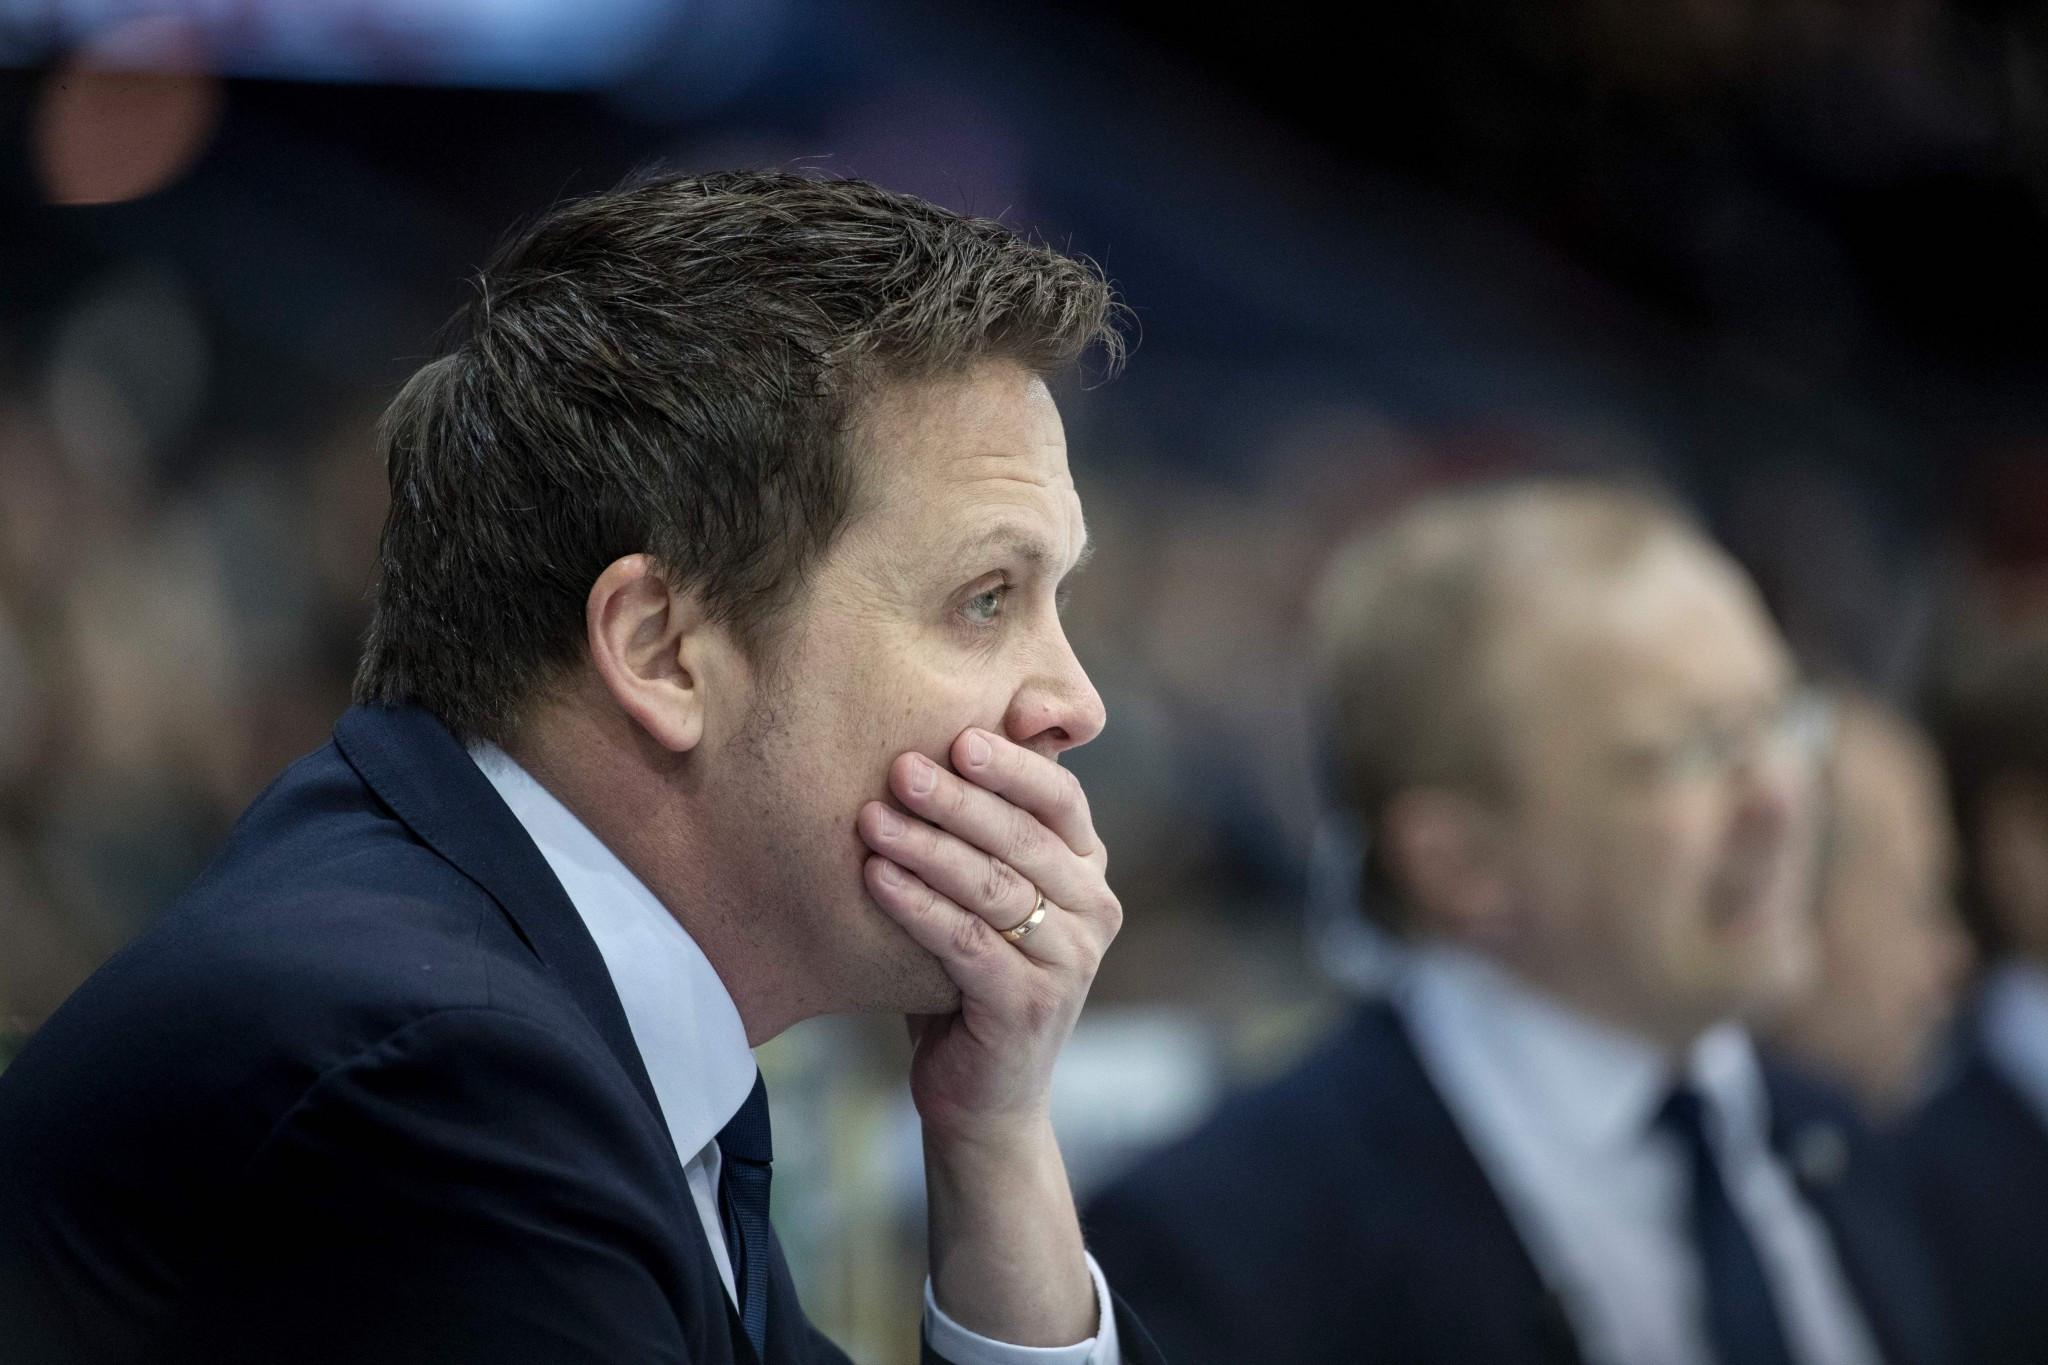 Marjamaki to depart as Finland's ice hockey head coach